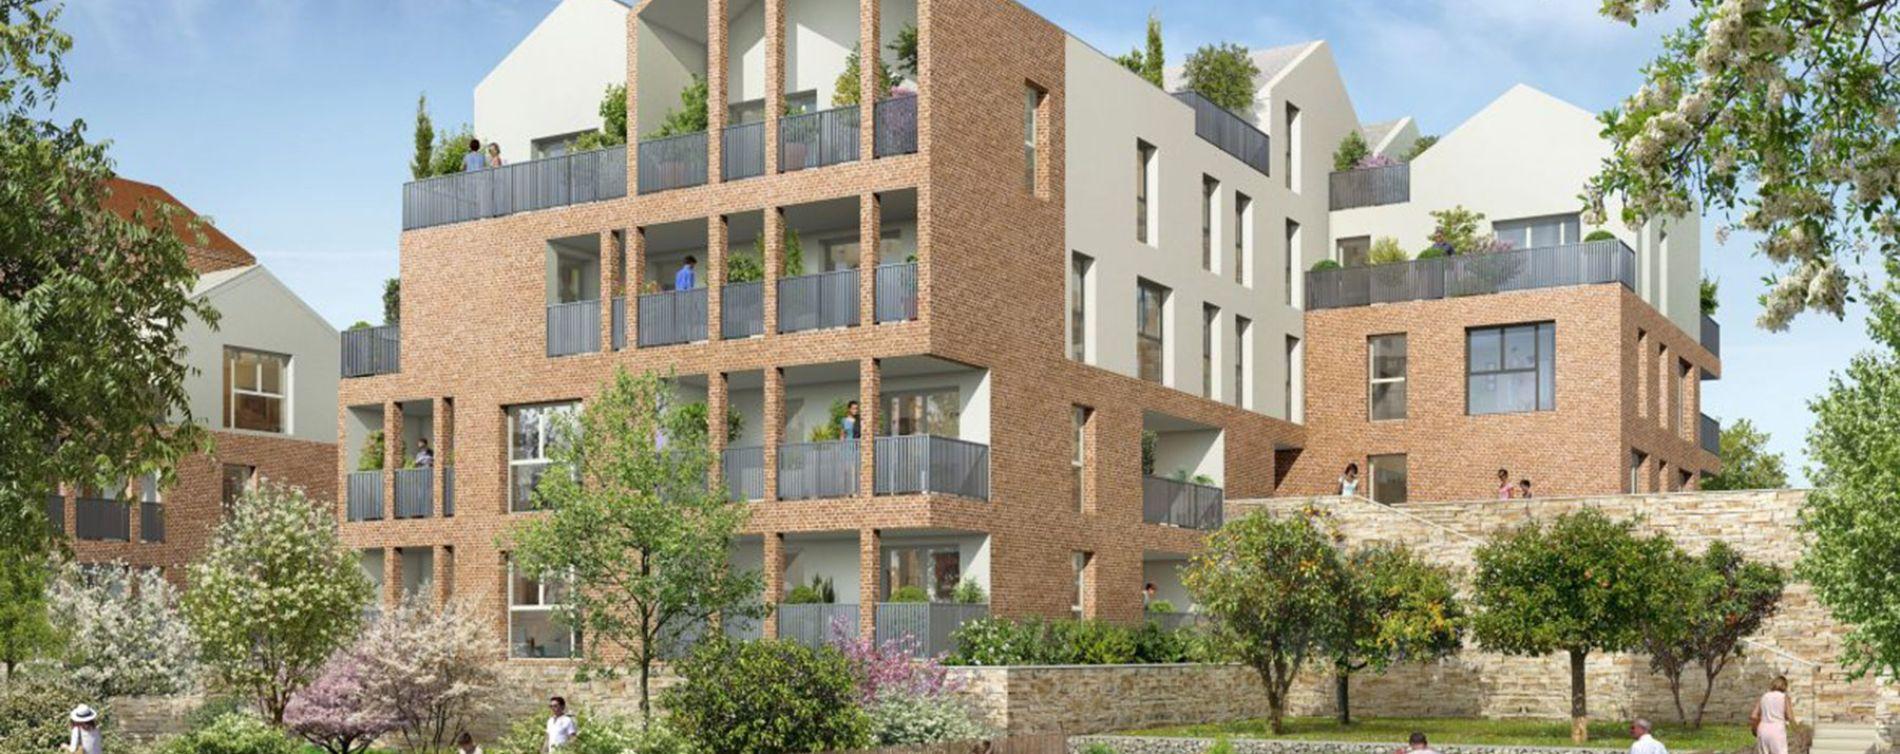 Balma : programme immobilier neuve « Murmures » (2)